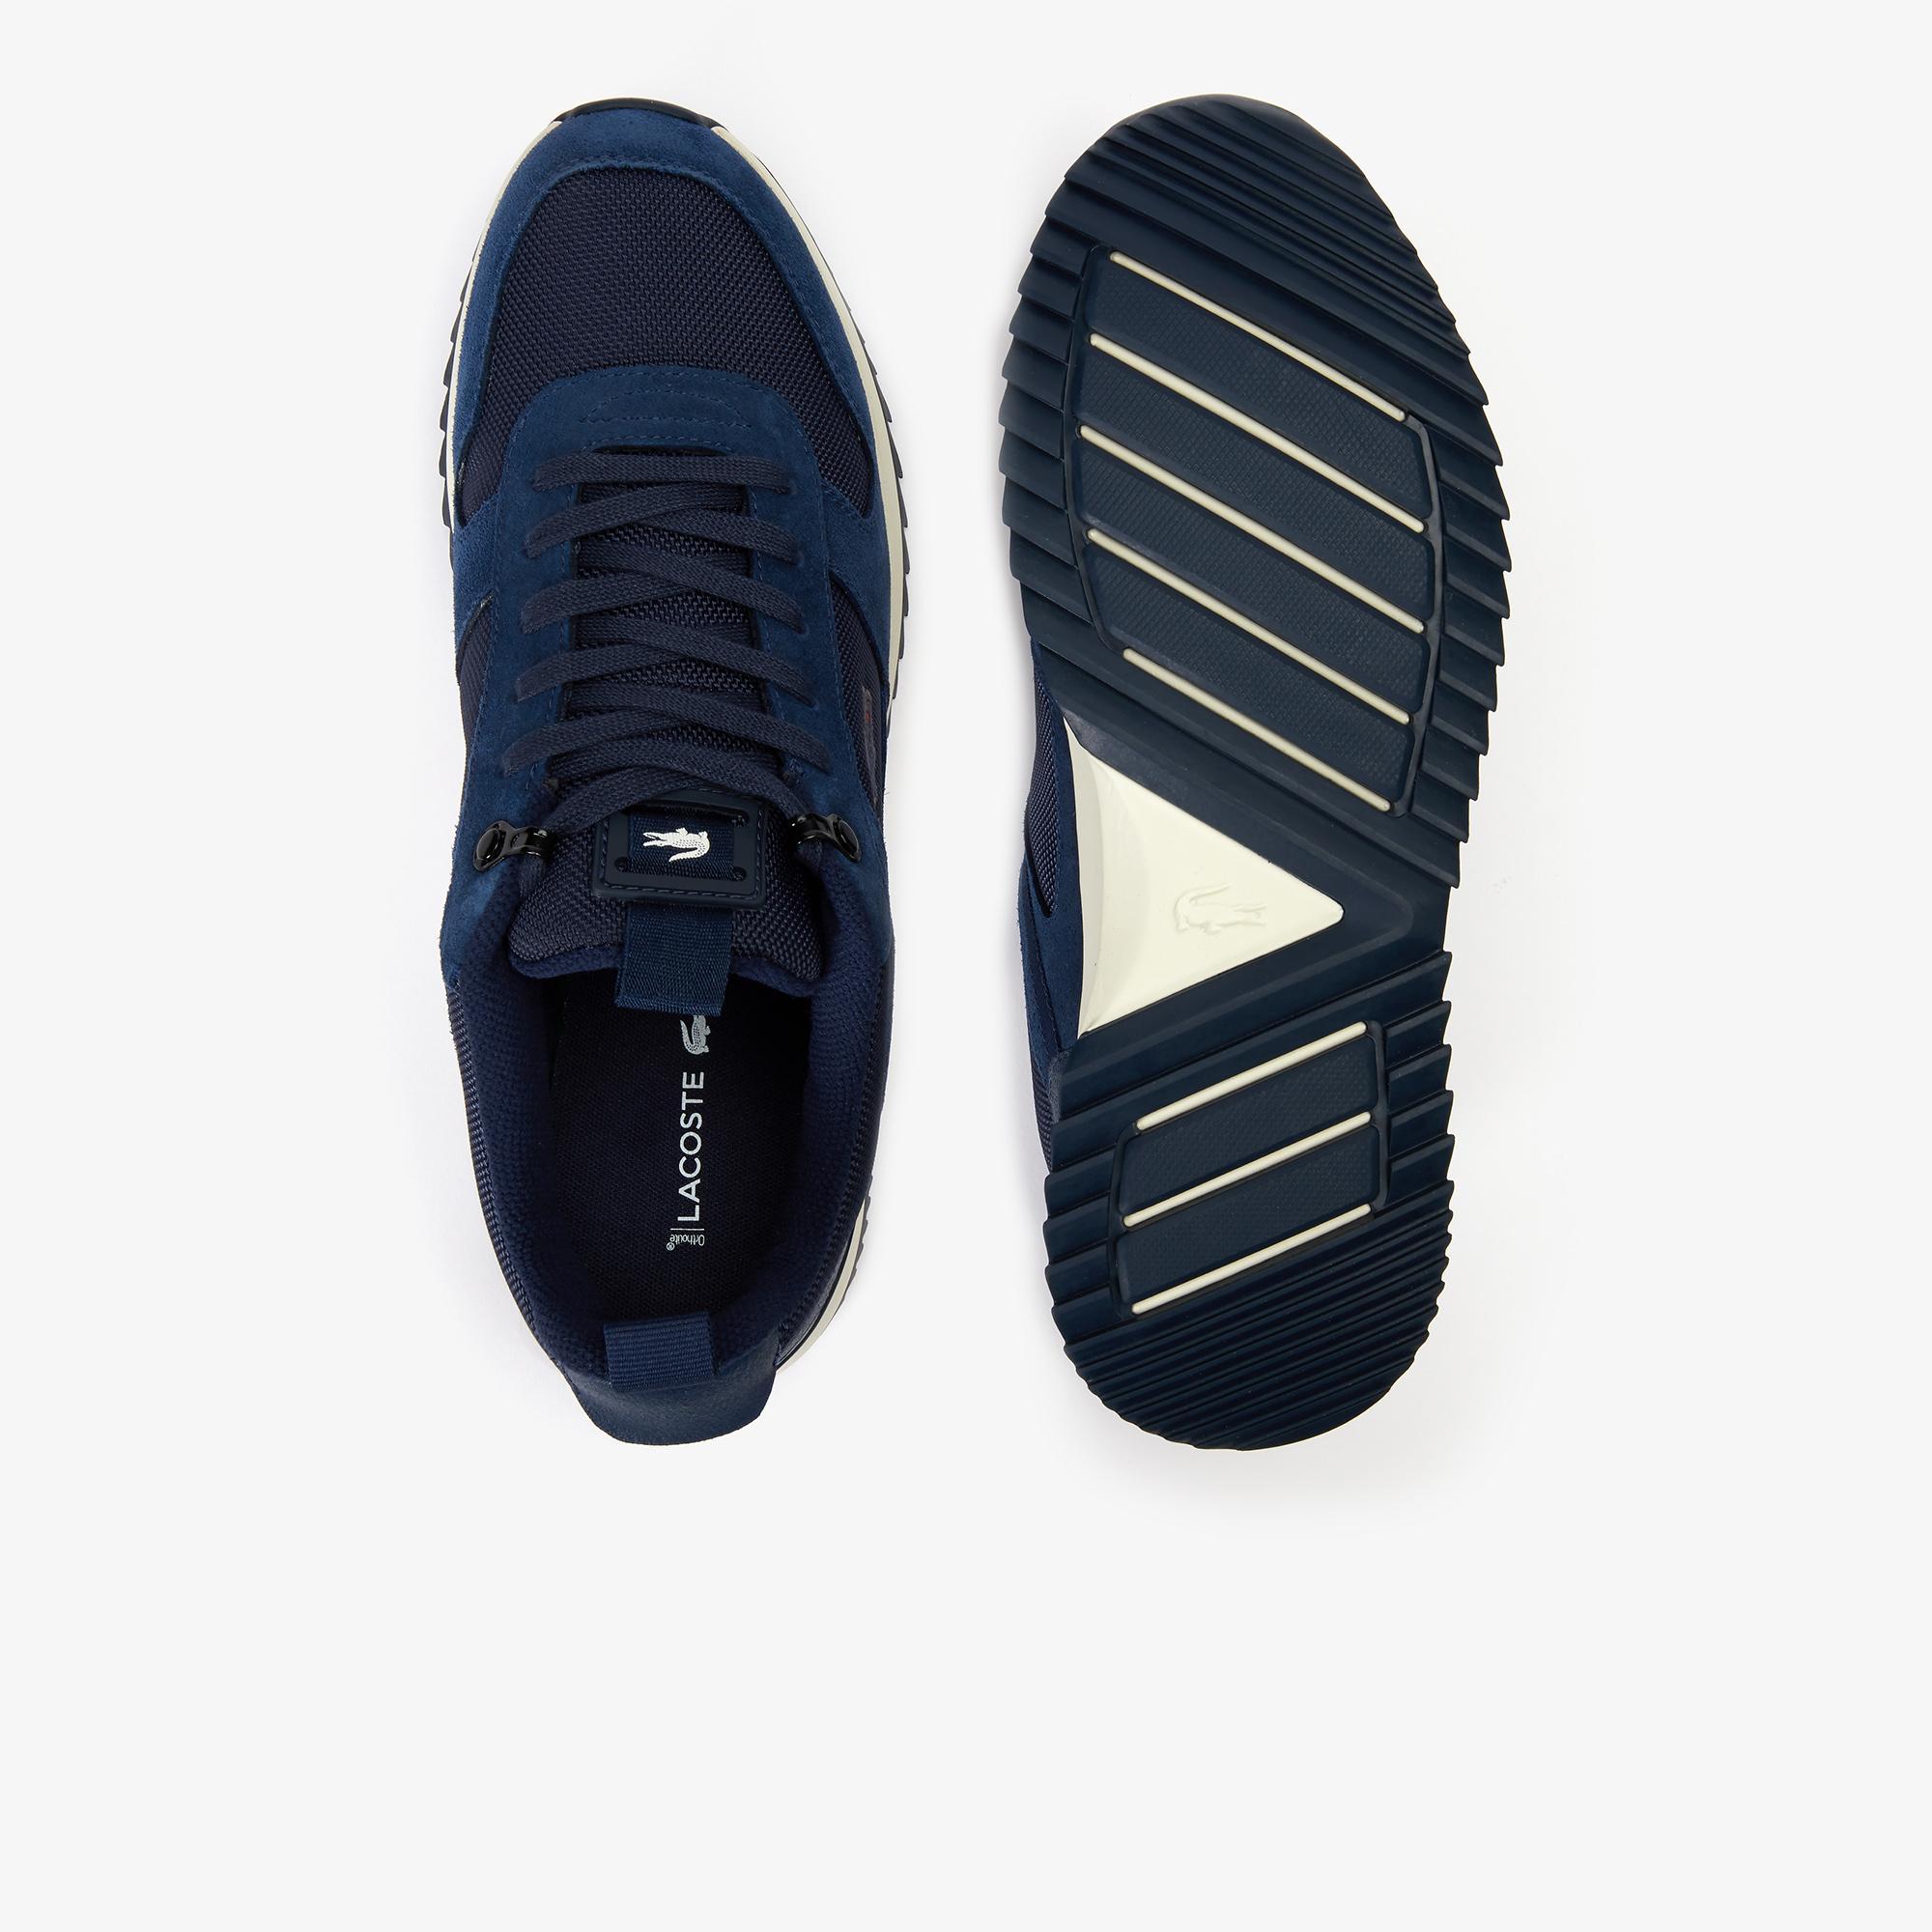 Lacoste Joggeur 2.0 319 1 Sma Erkek Lacivert - Koyu Mavi Sneaker